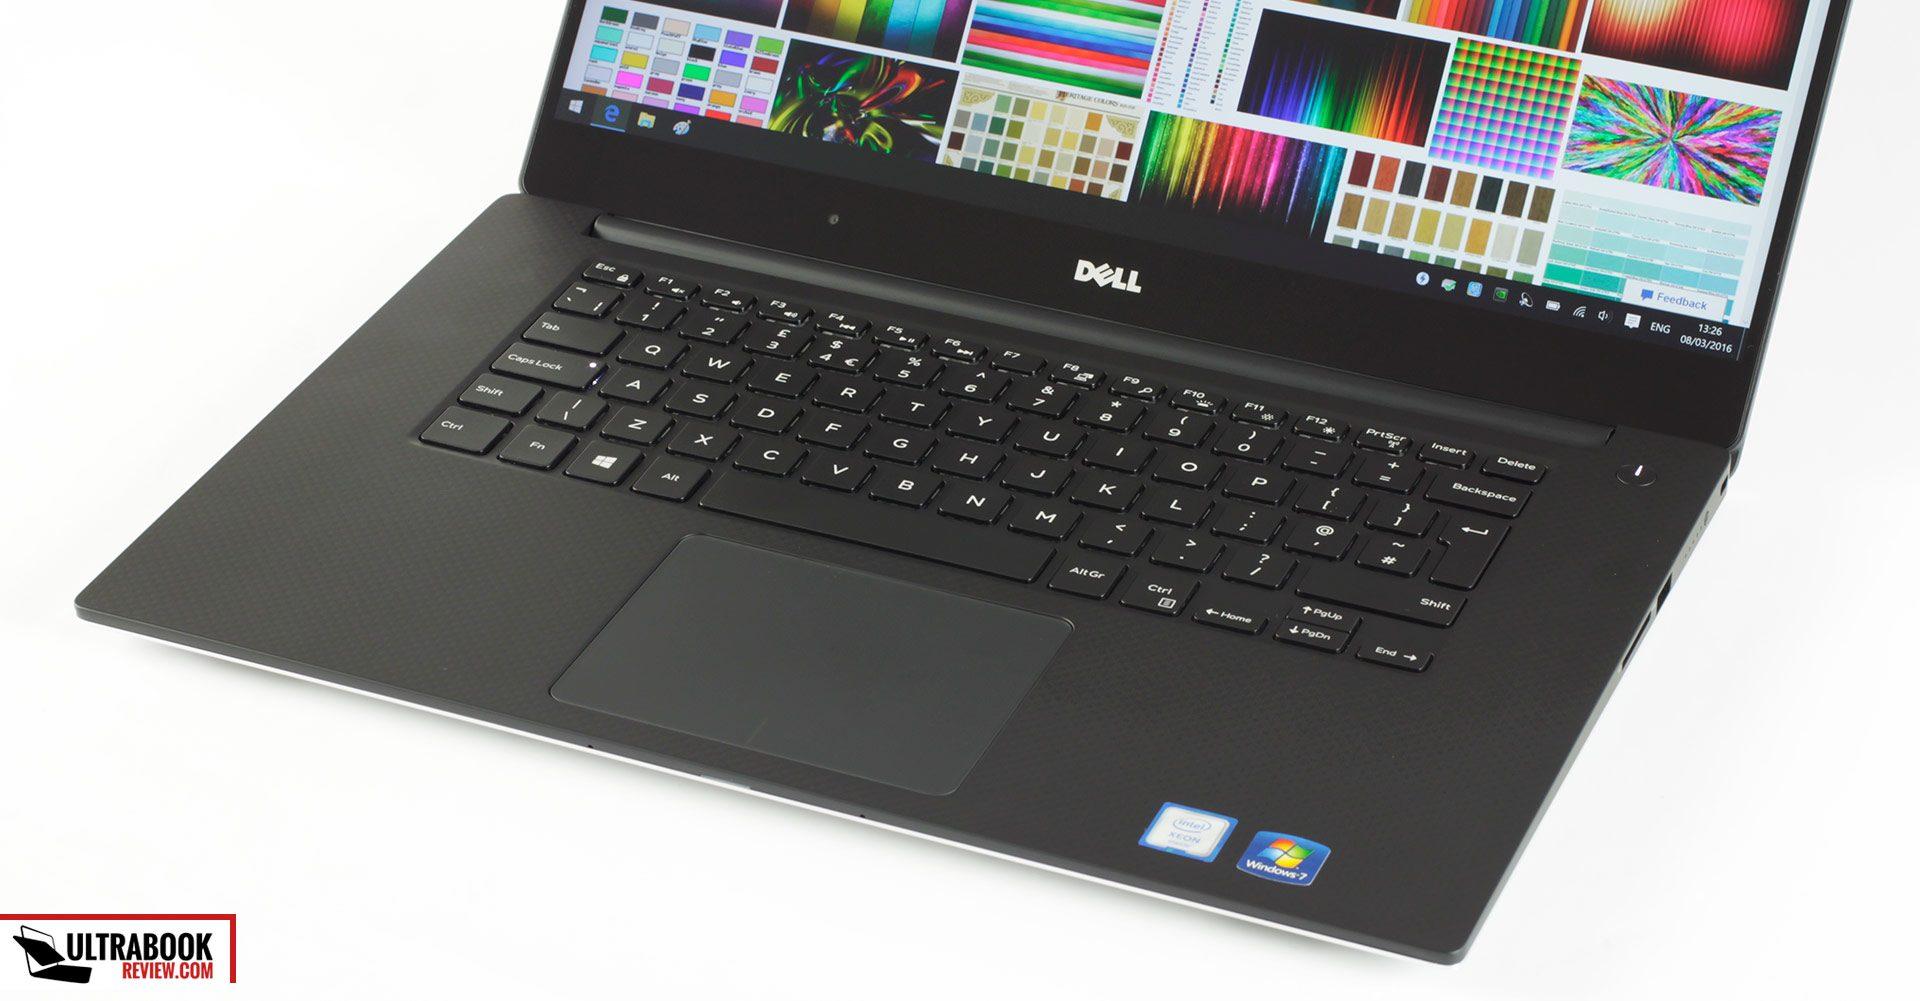 Dell Precision 5510 review - the portable workstation